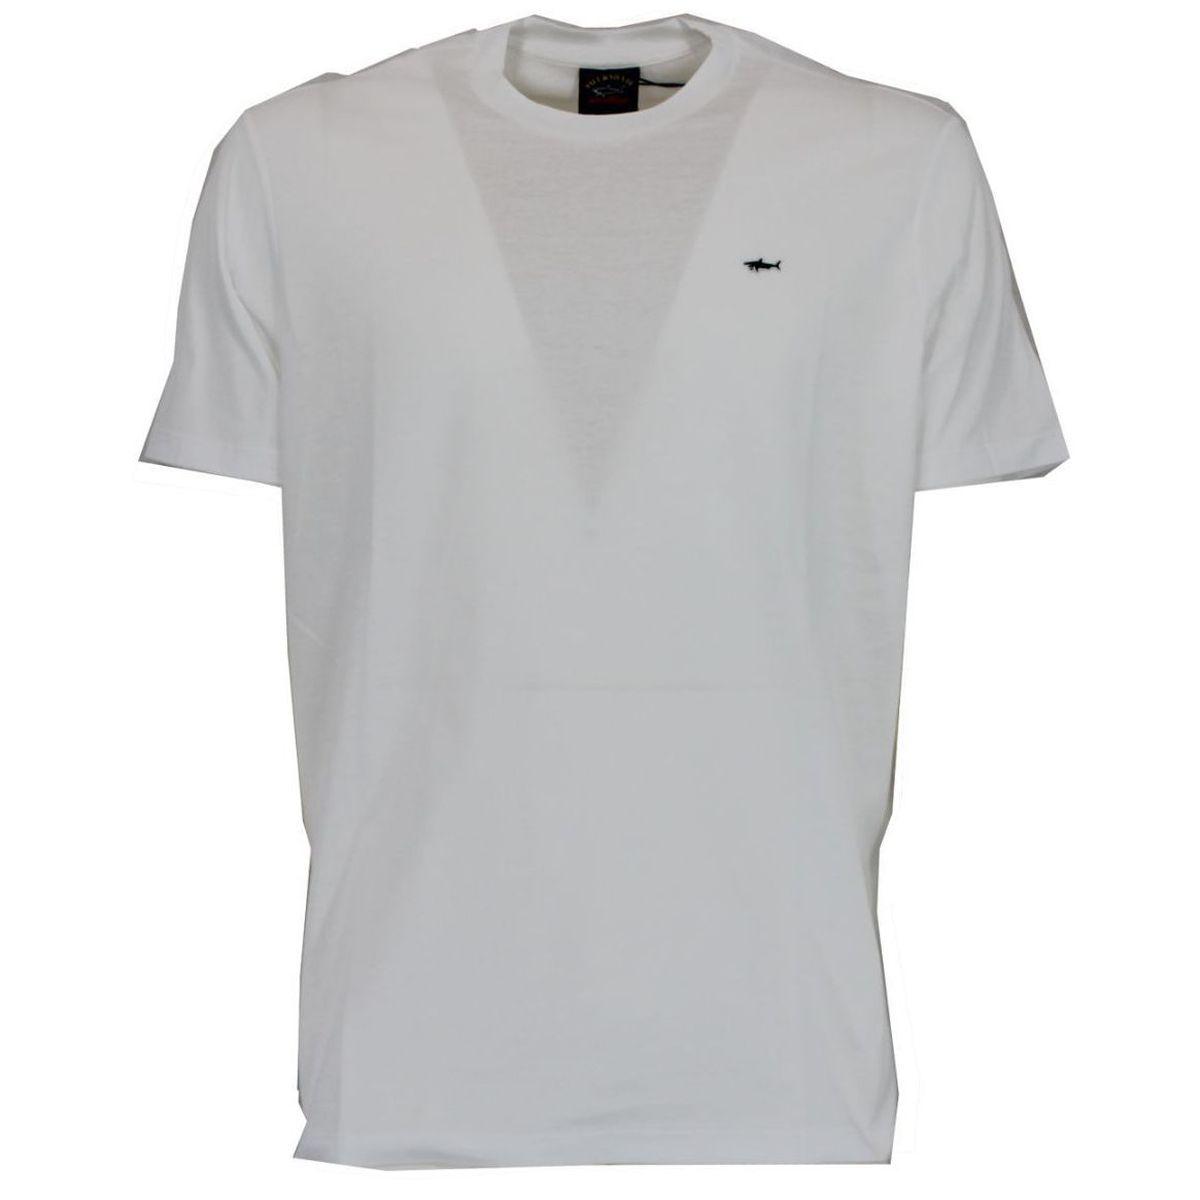 T-shirt in cotone con logo ricamato Bianco PAUL & SHARK